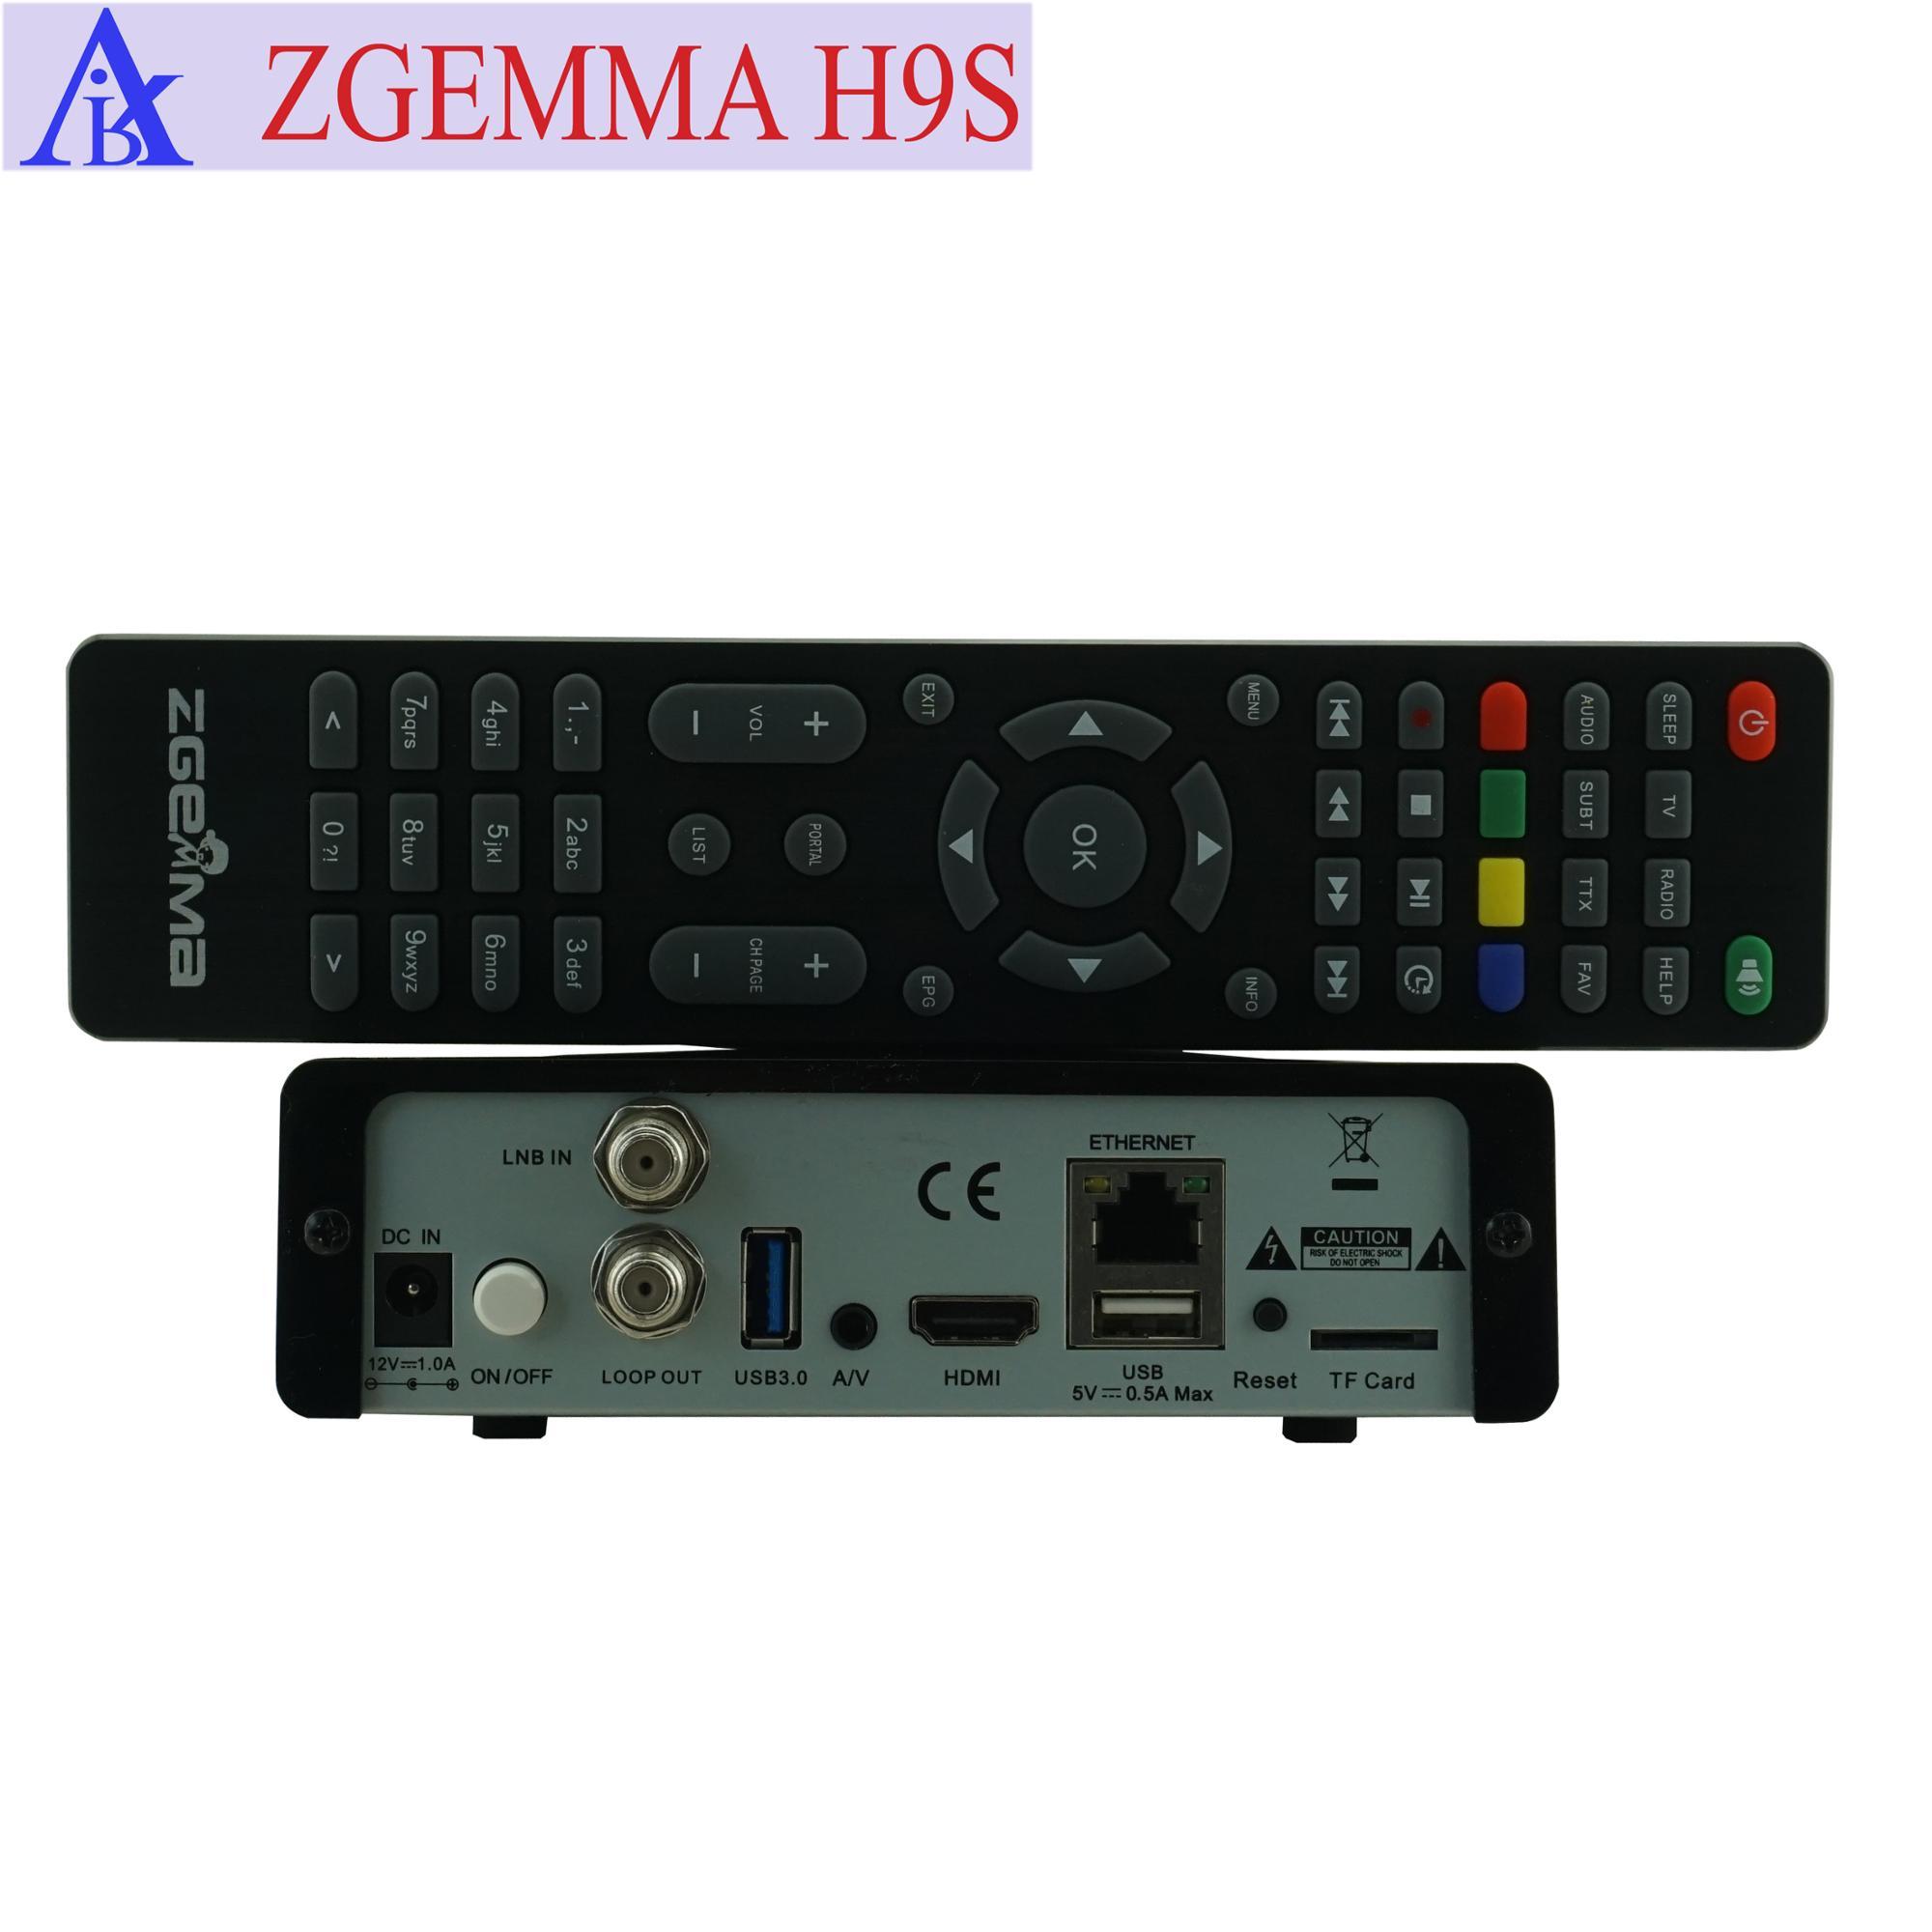 Oscam/cccam/qt Stalker Iptv 4k Uhd Tv Box Zgemma H9s Linux Os E2 Dvb-s2x  One Tuner - Buy Zgemma H9s Satellite Receiver,Air Digital 4k Uhd Tv